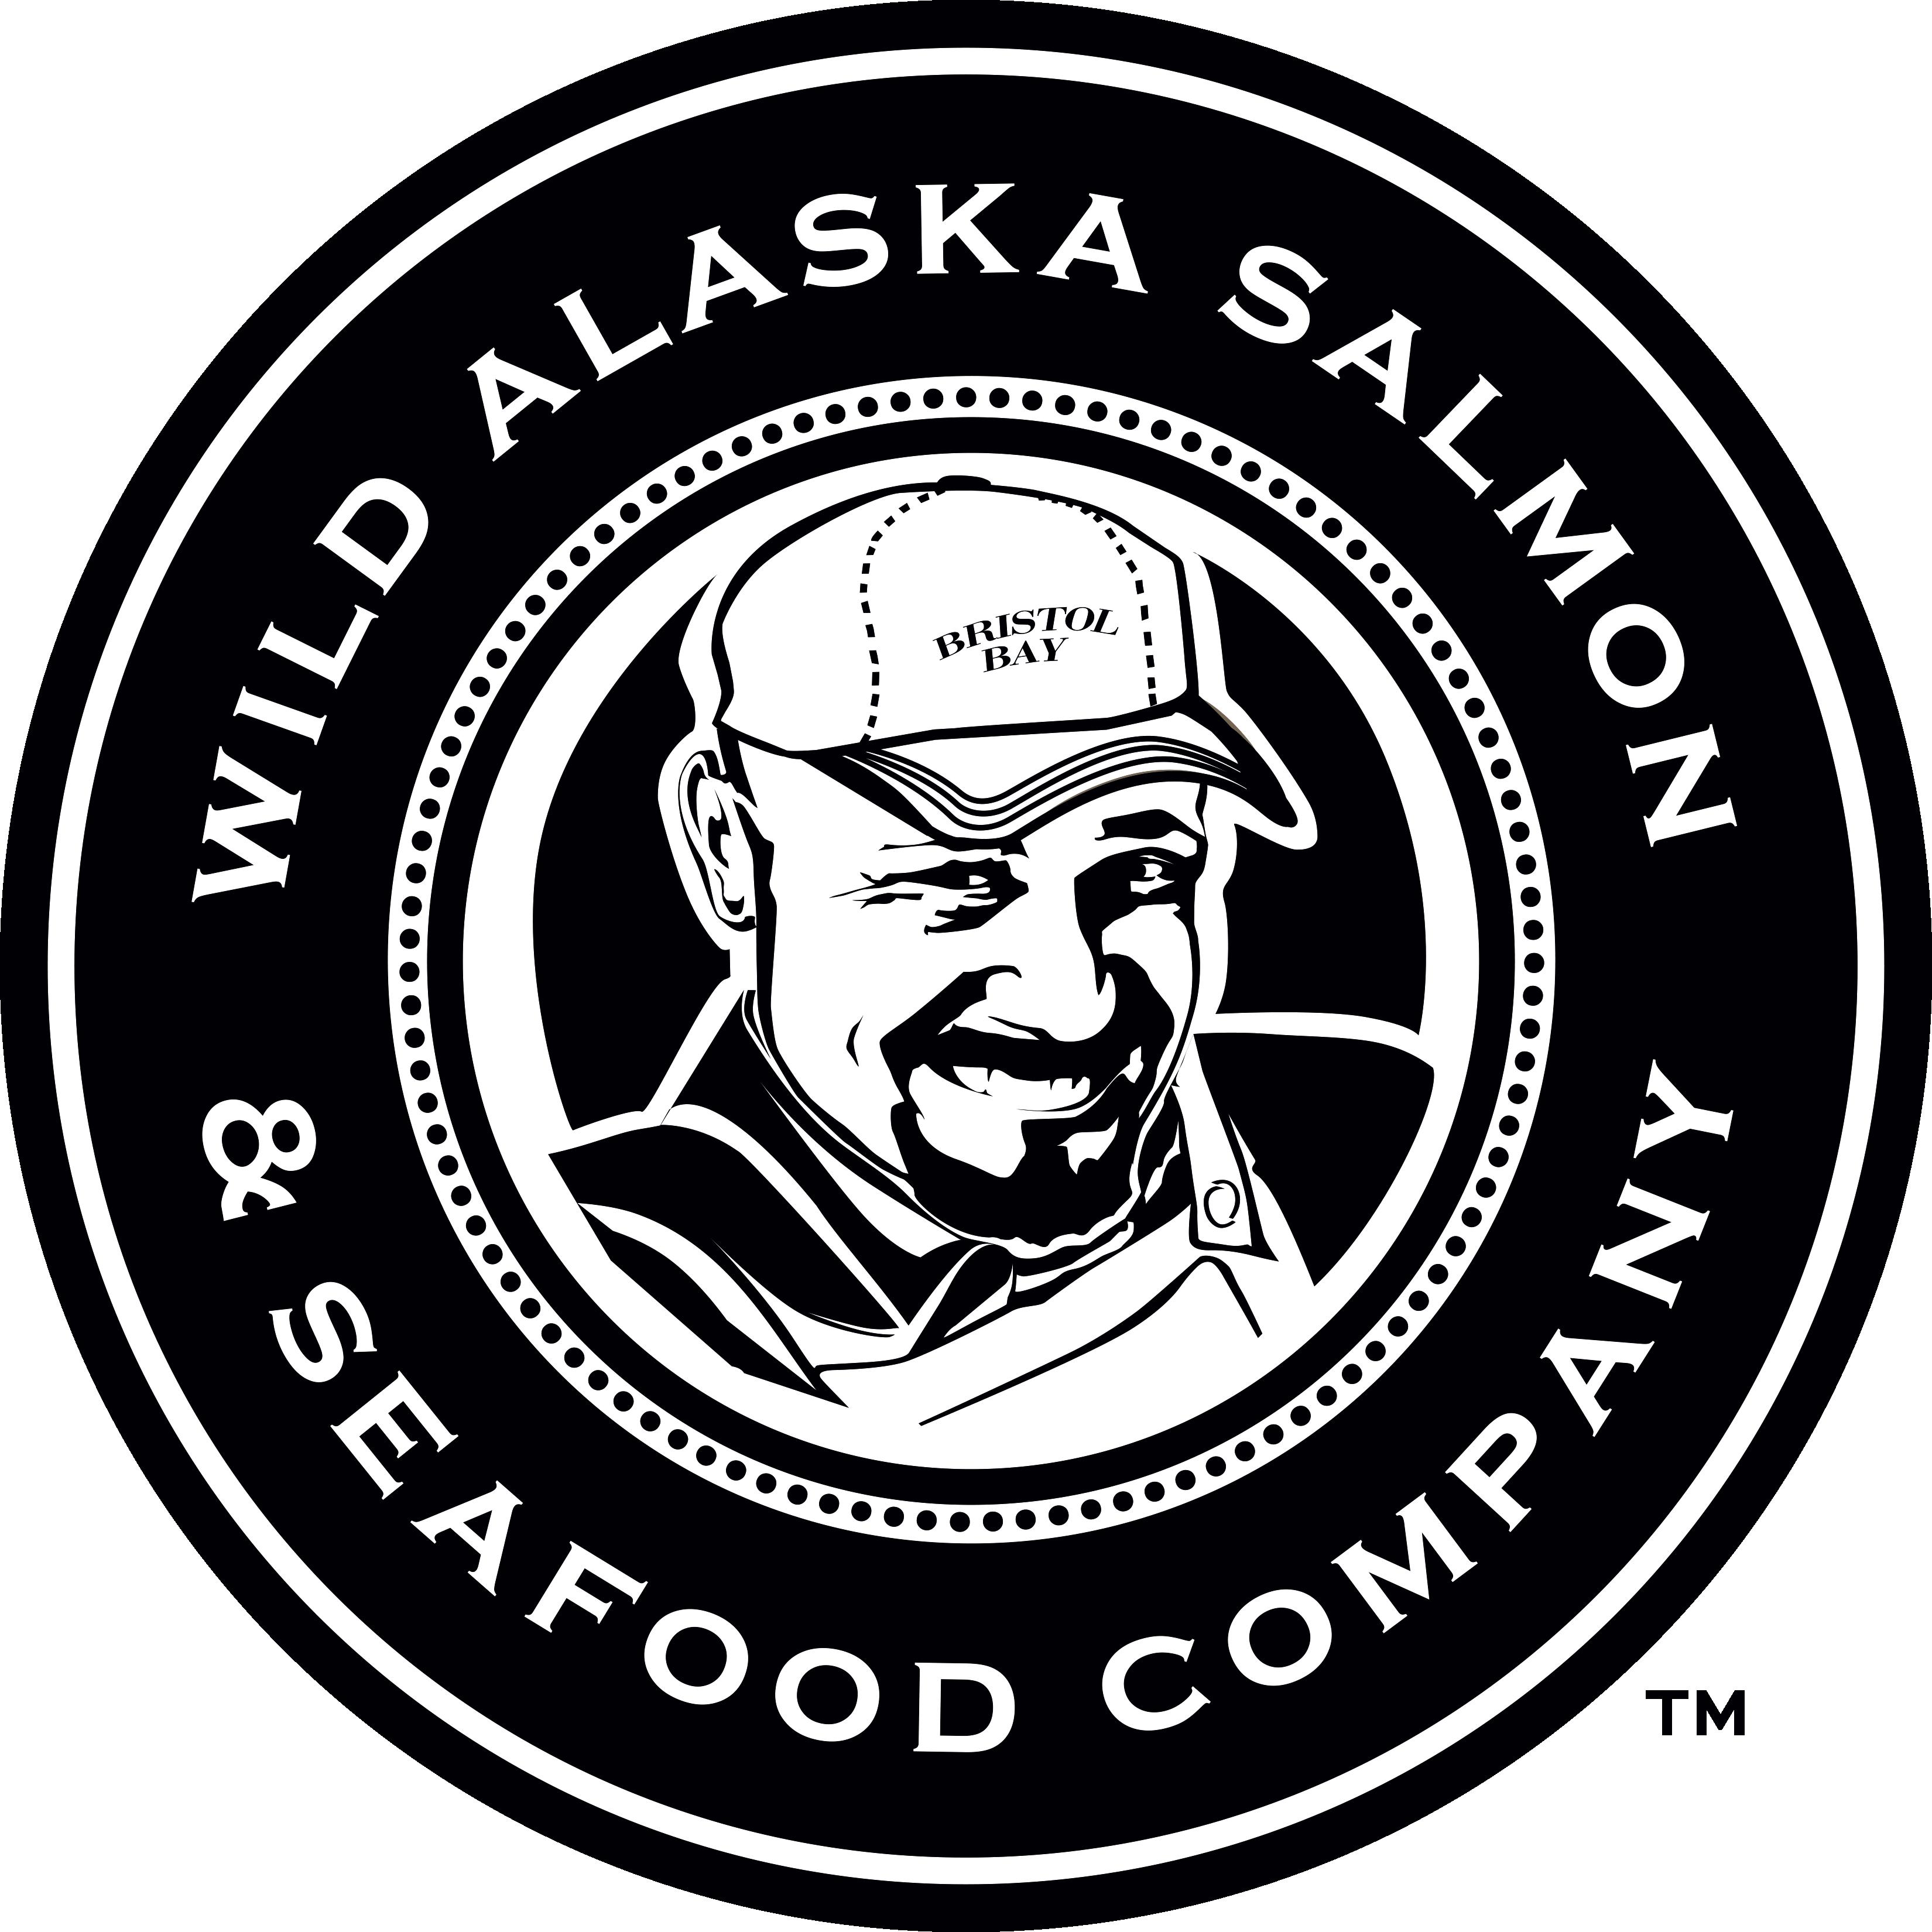 WILD ALASKA SALMON & SEAFOOD CO.